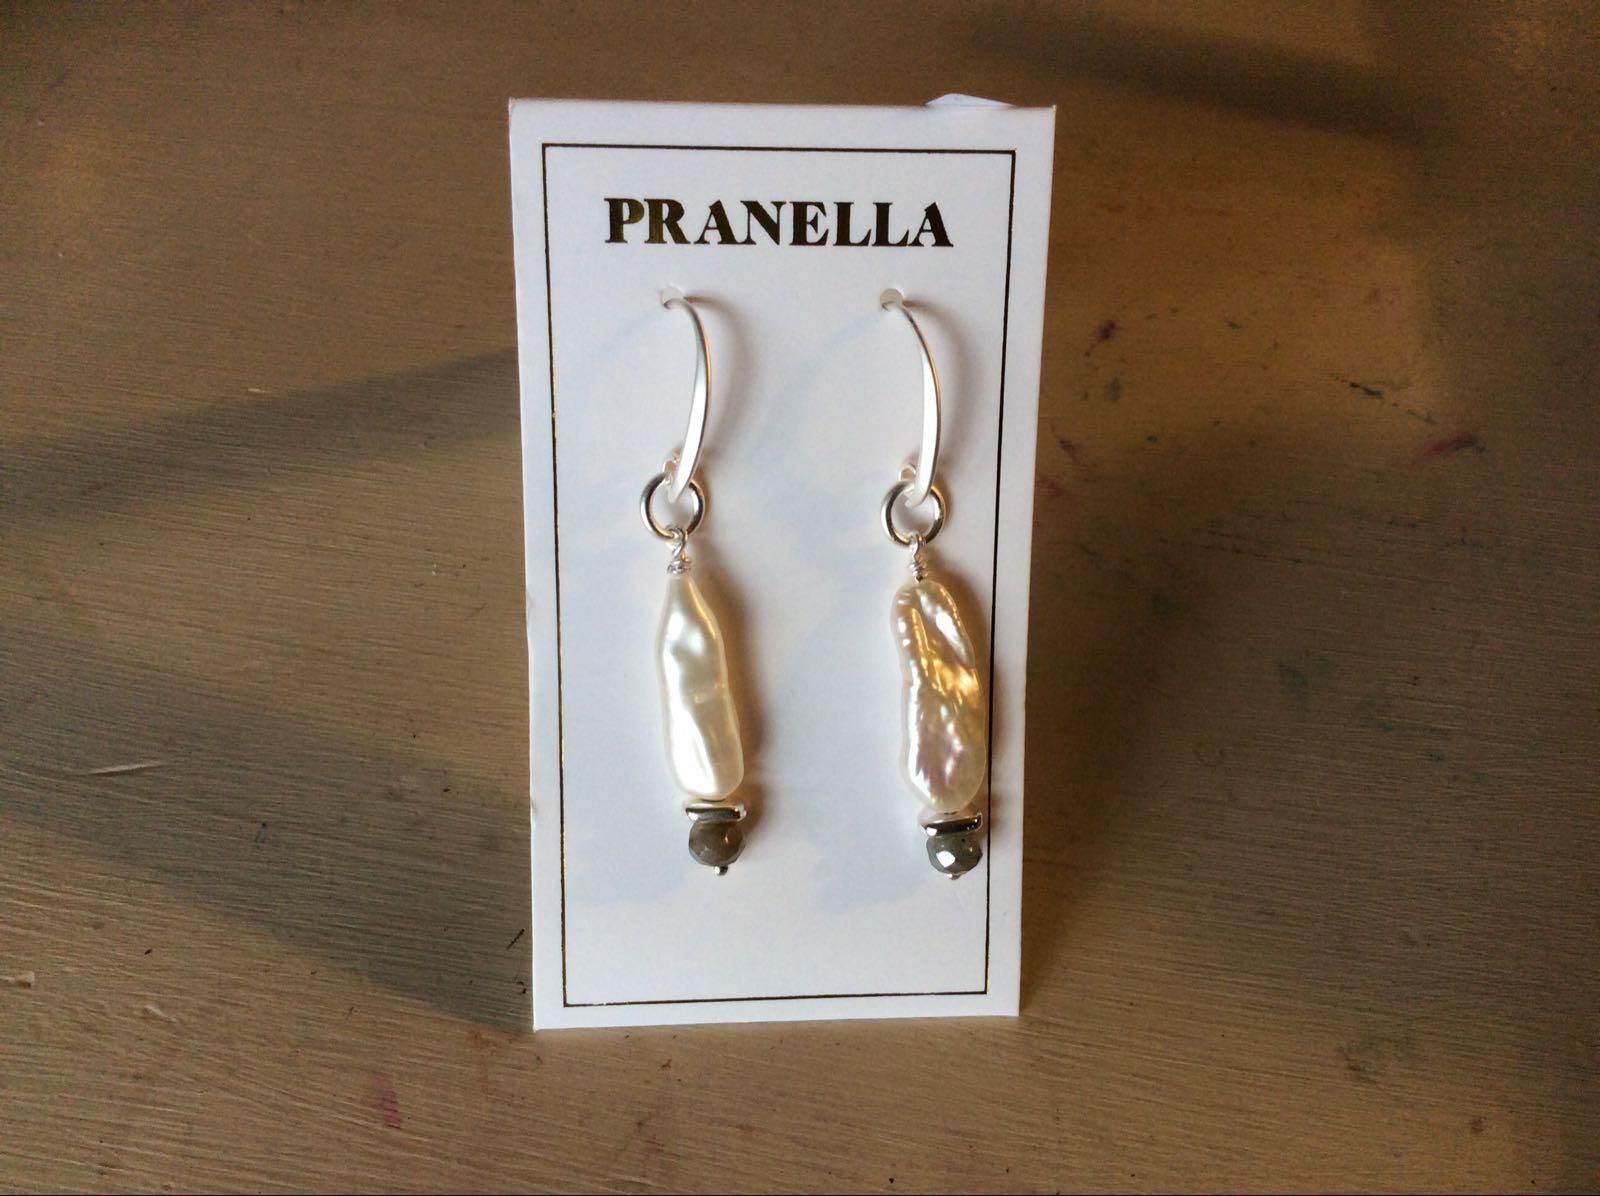 Pranella liberty pearl earrings £37